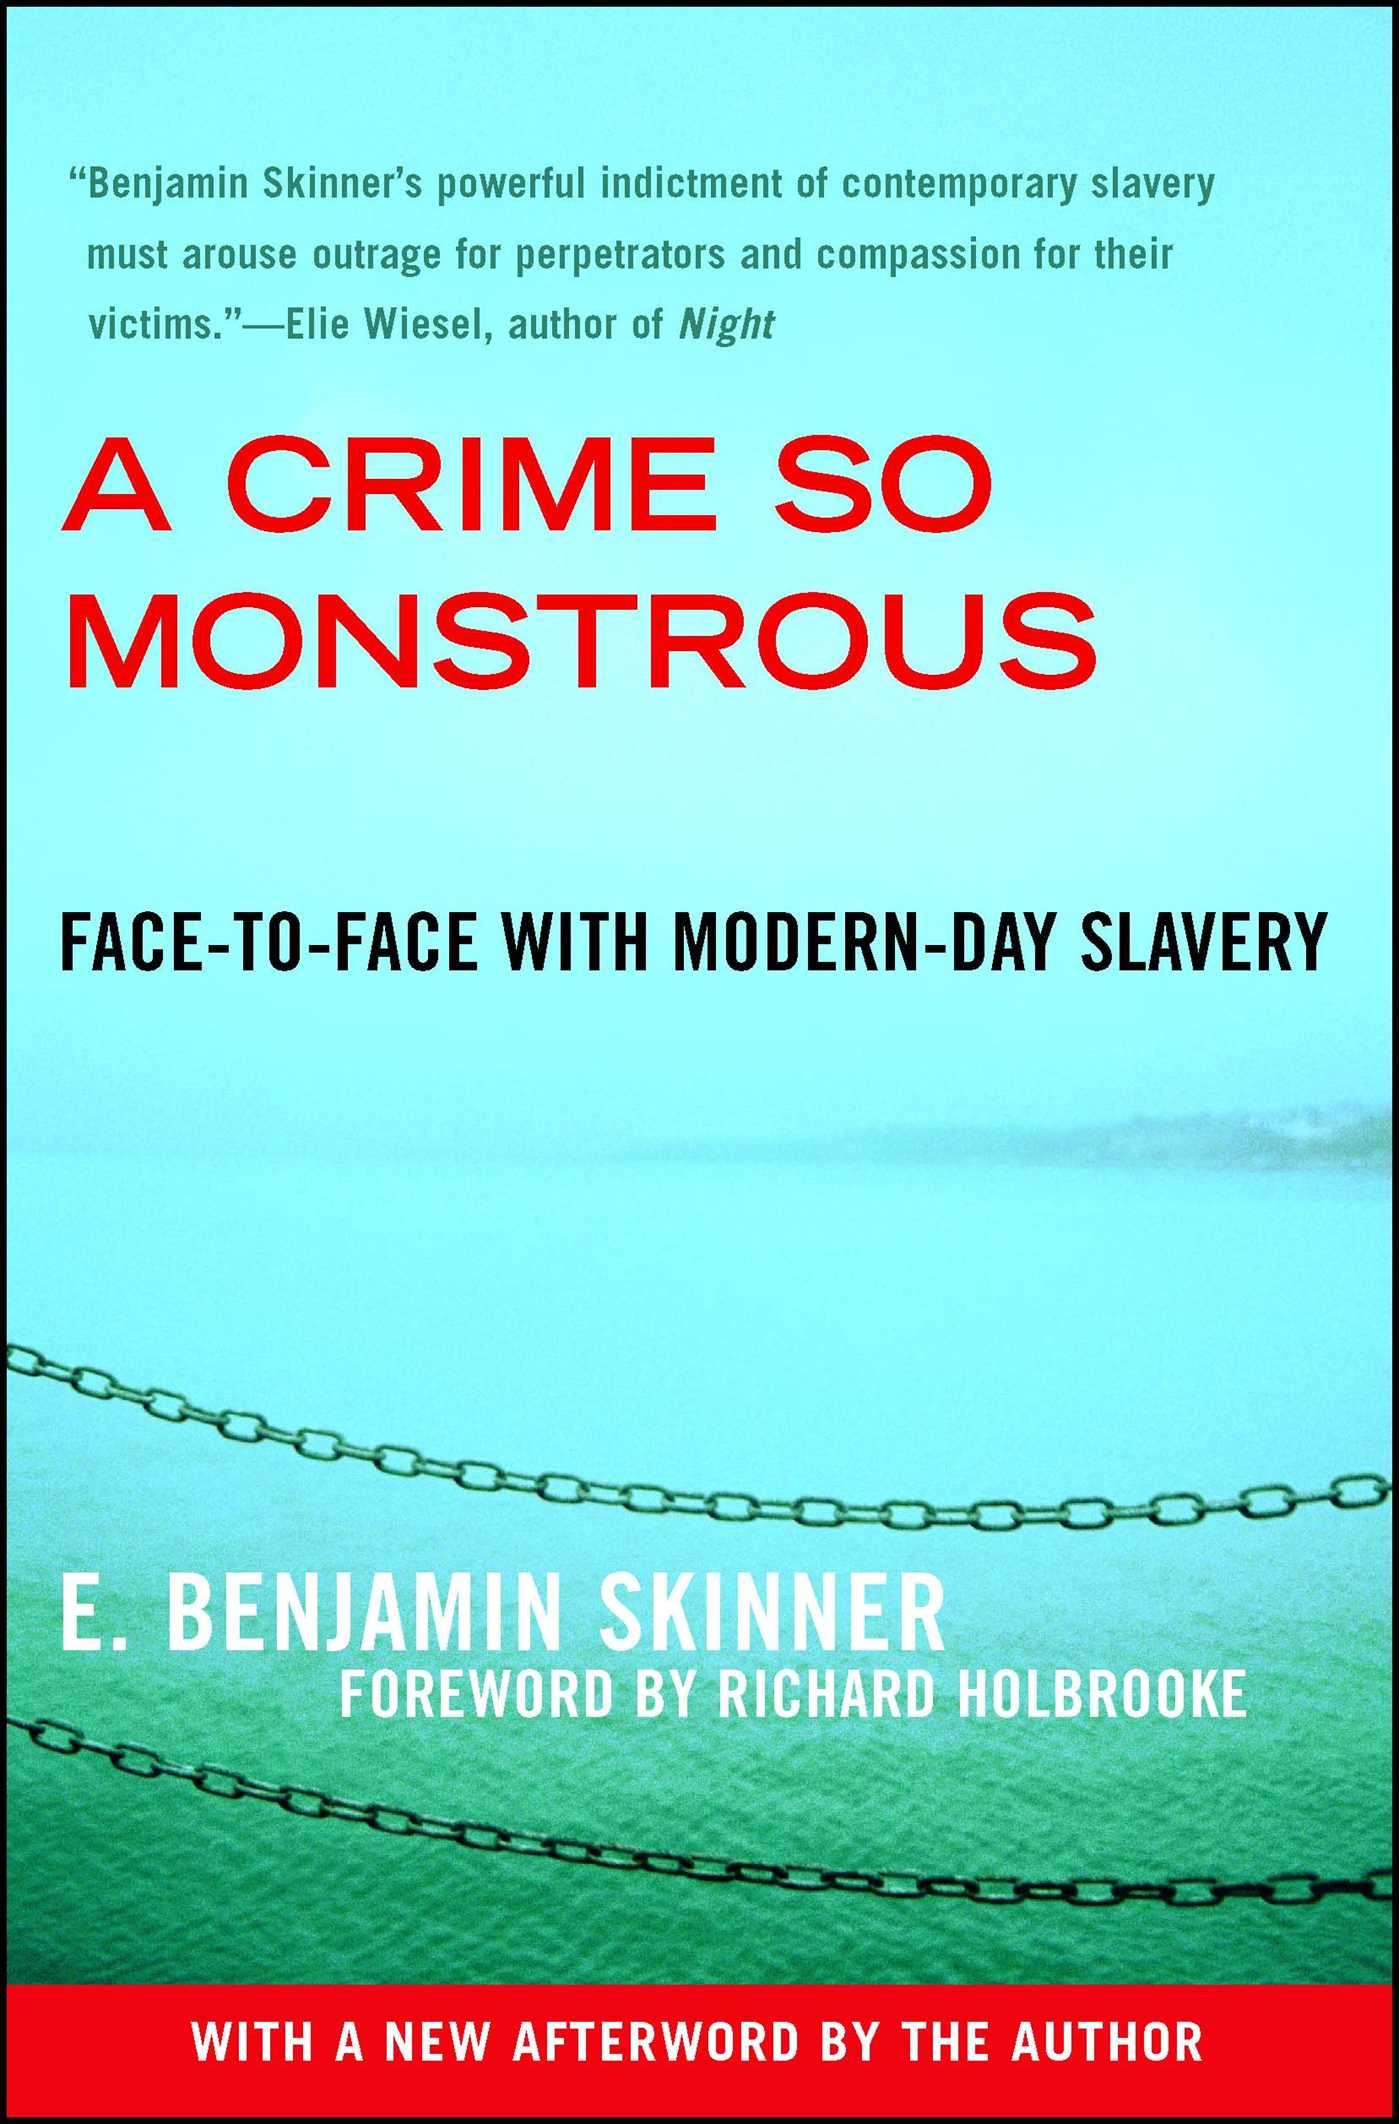 A Crime So Monstrous | Book by E  Benjamin Skinner